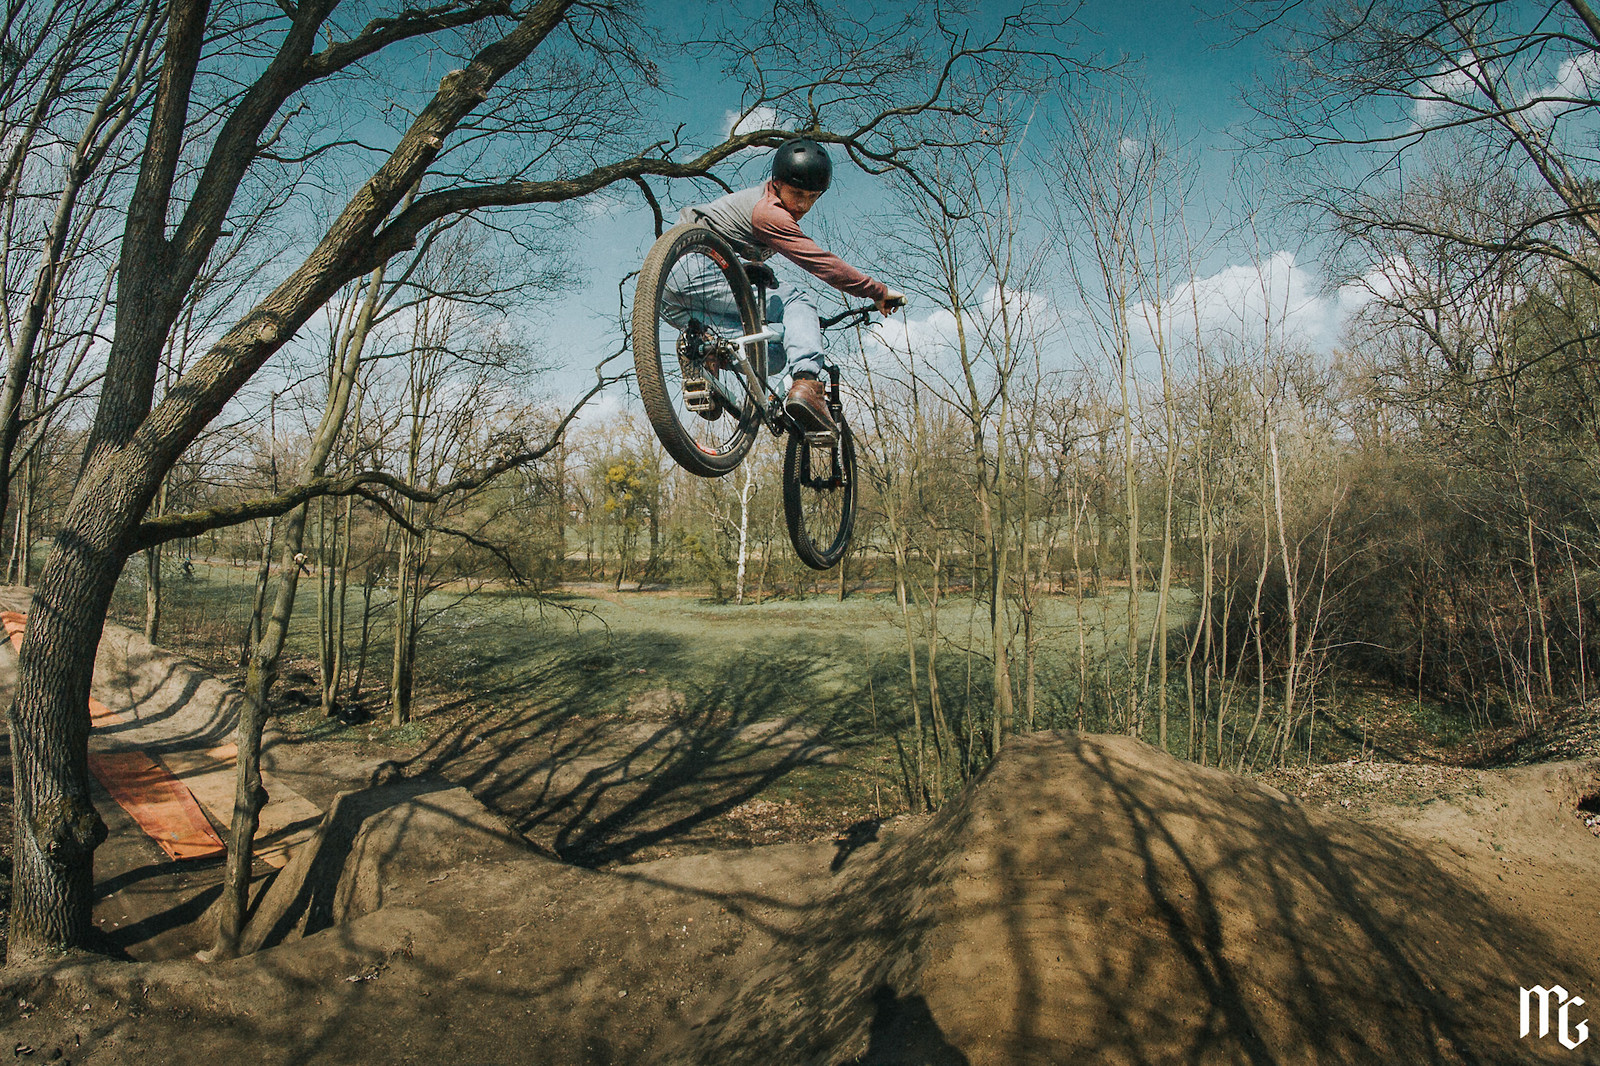 Whip - Kick!Photo - Mountain Biking Pictures - Vital MTB